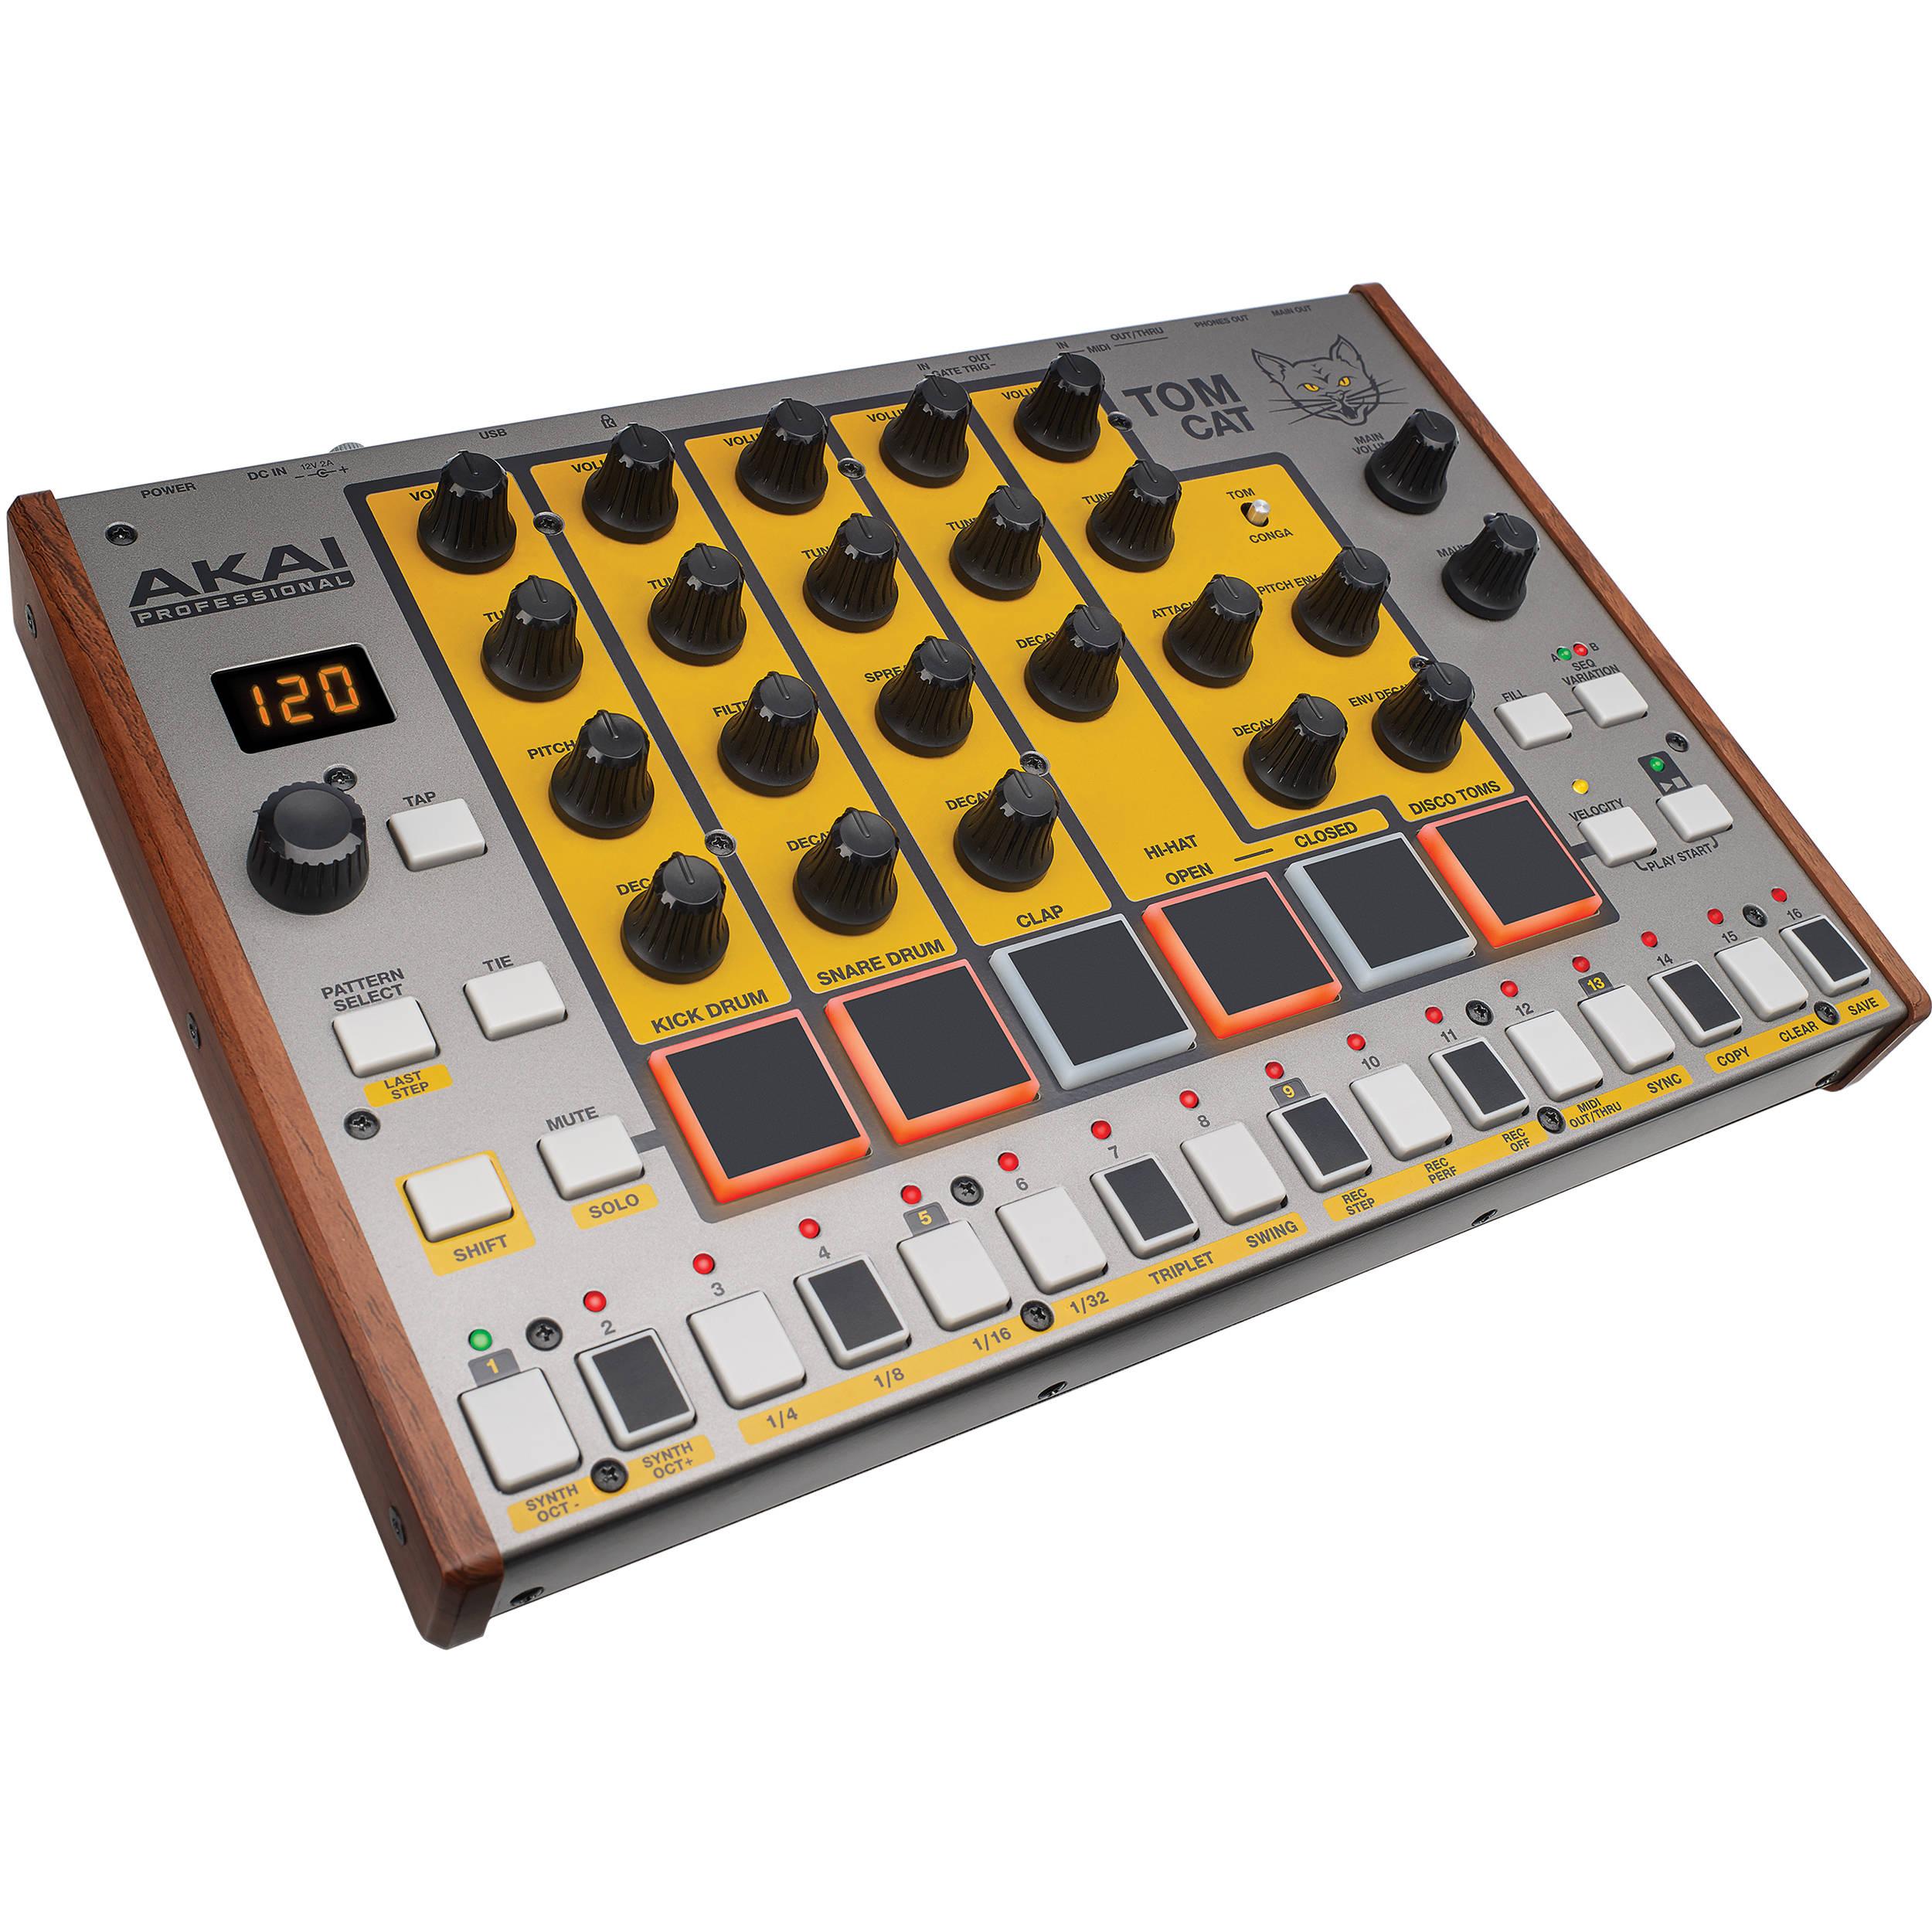 akai professional tom cat analog drum machine tom cat b h photo. Black Bedroom Furniture Sets. Home Design Ideas